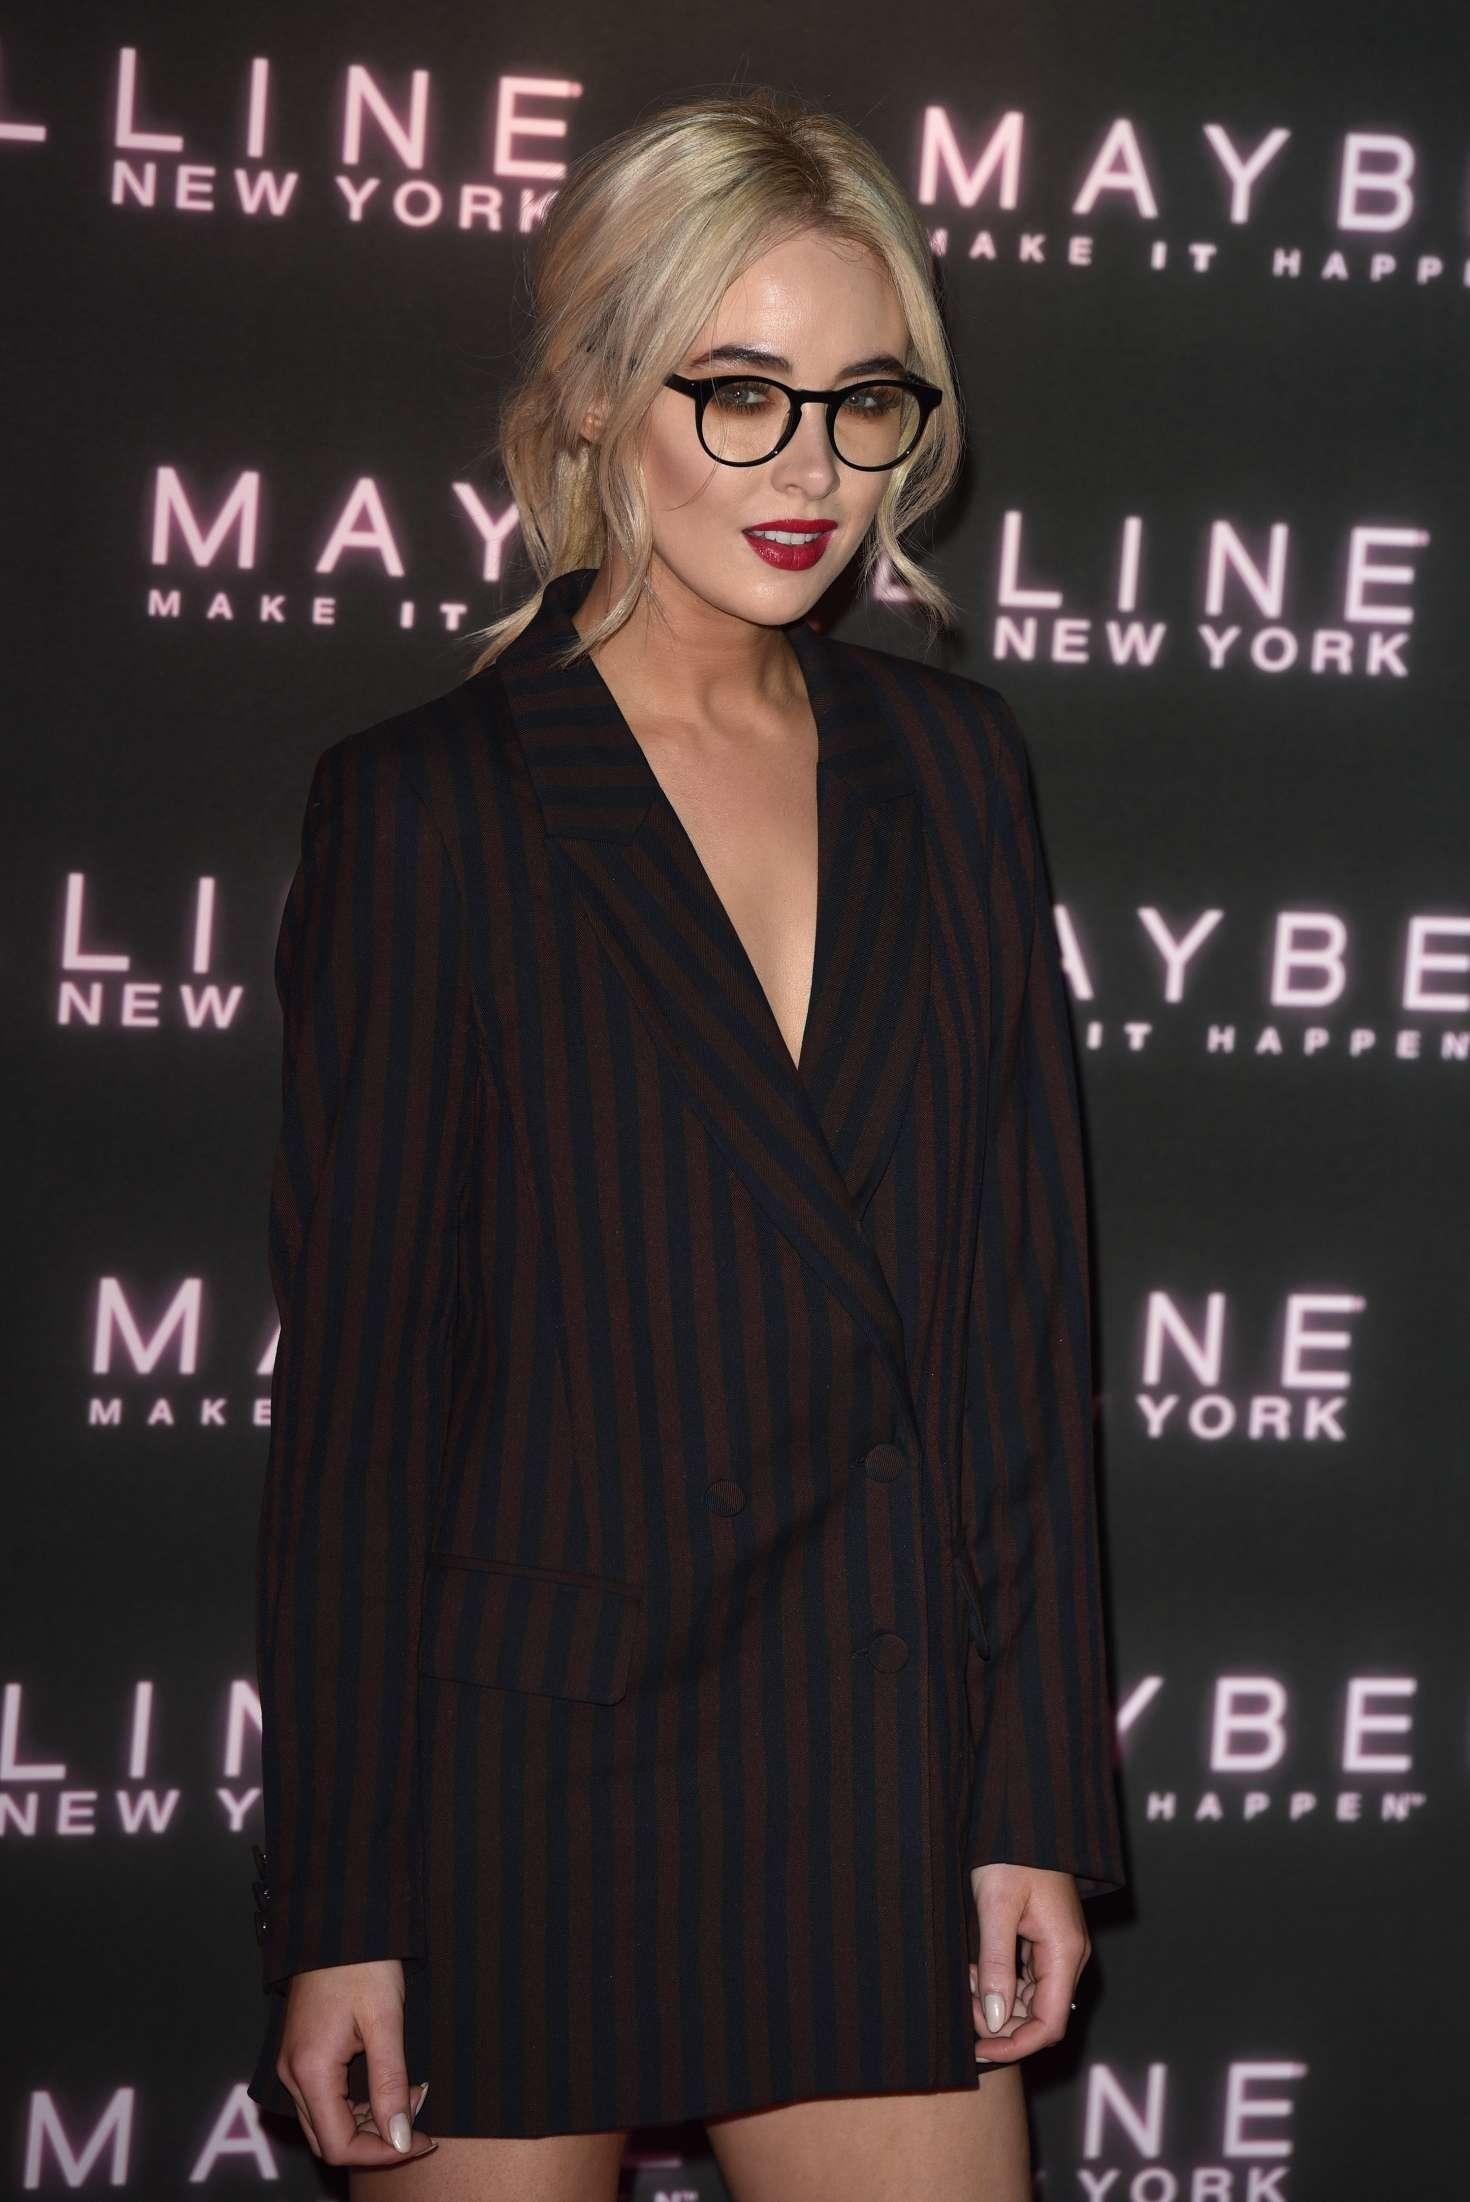 Maybelline Party London Fashion Week